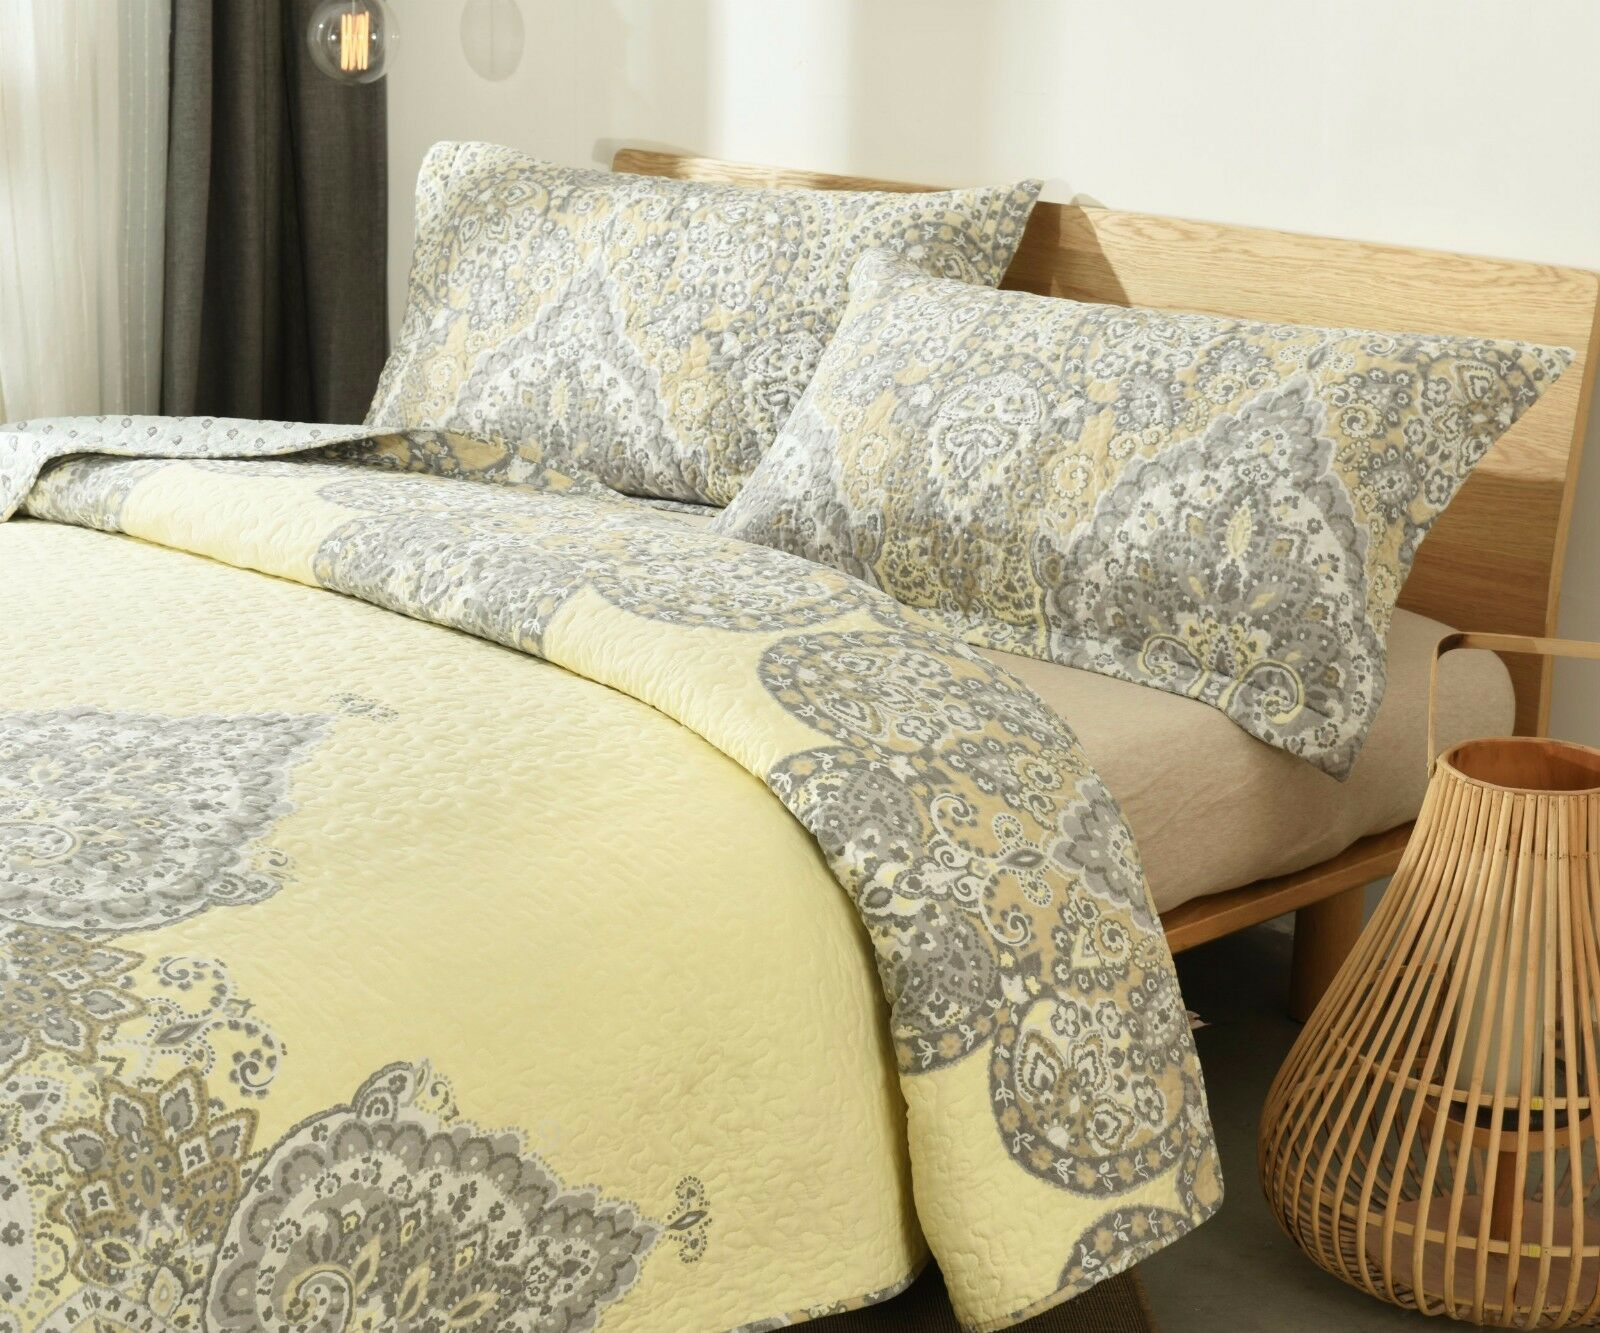 DaDa Bedding Bohemian Pale Lemon giallo Floral Medallion Floral Bedspread Set